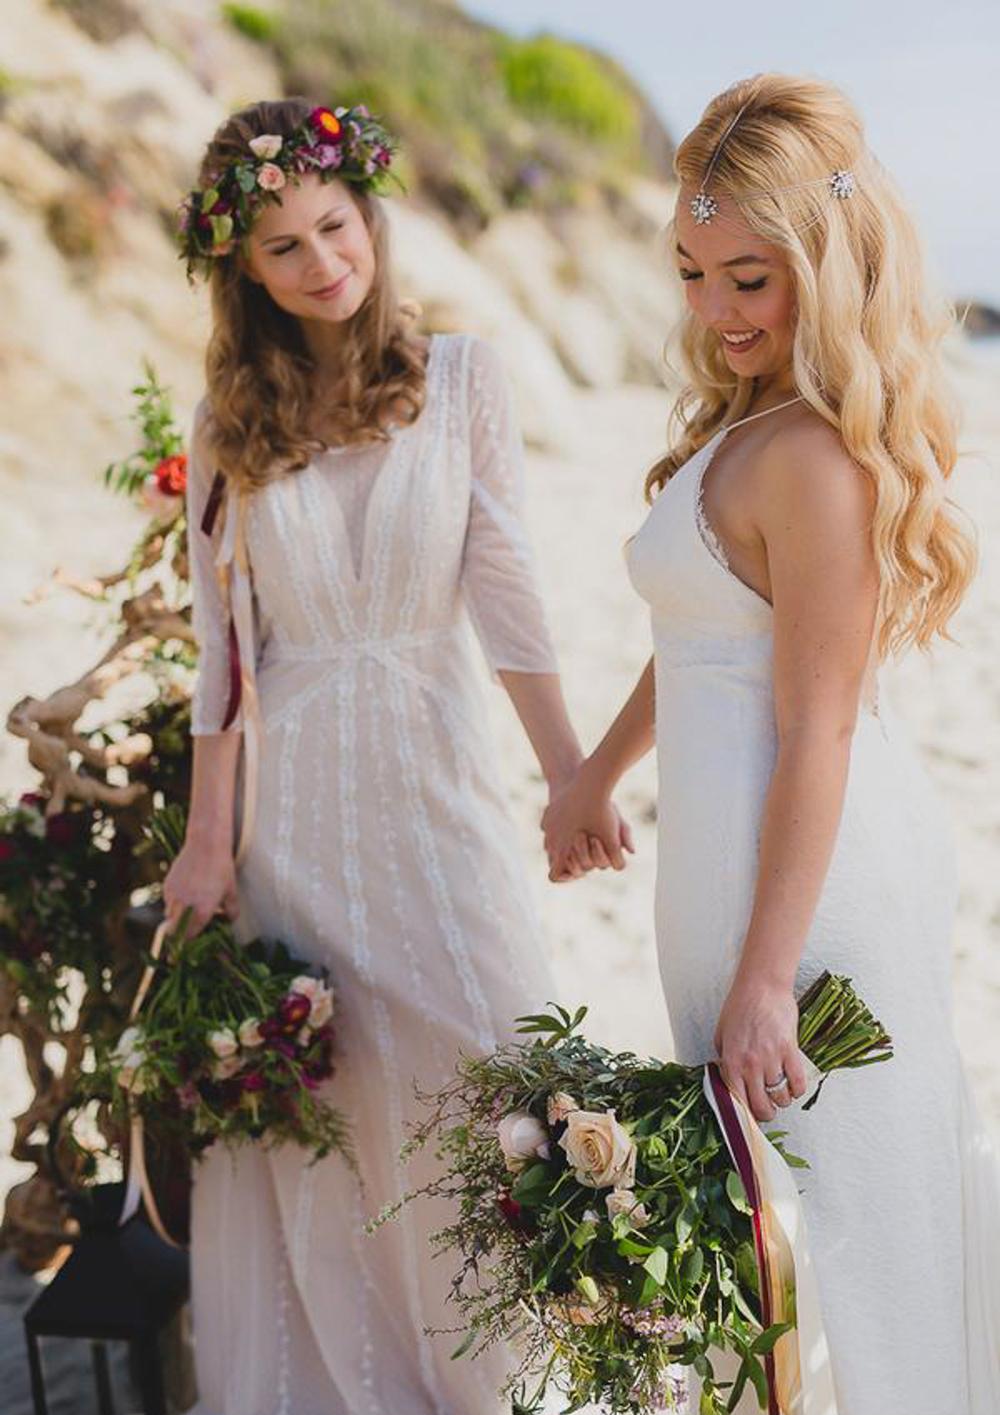 Orange County Wedding Hair and Makeup